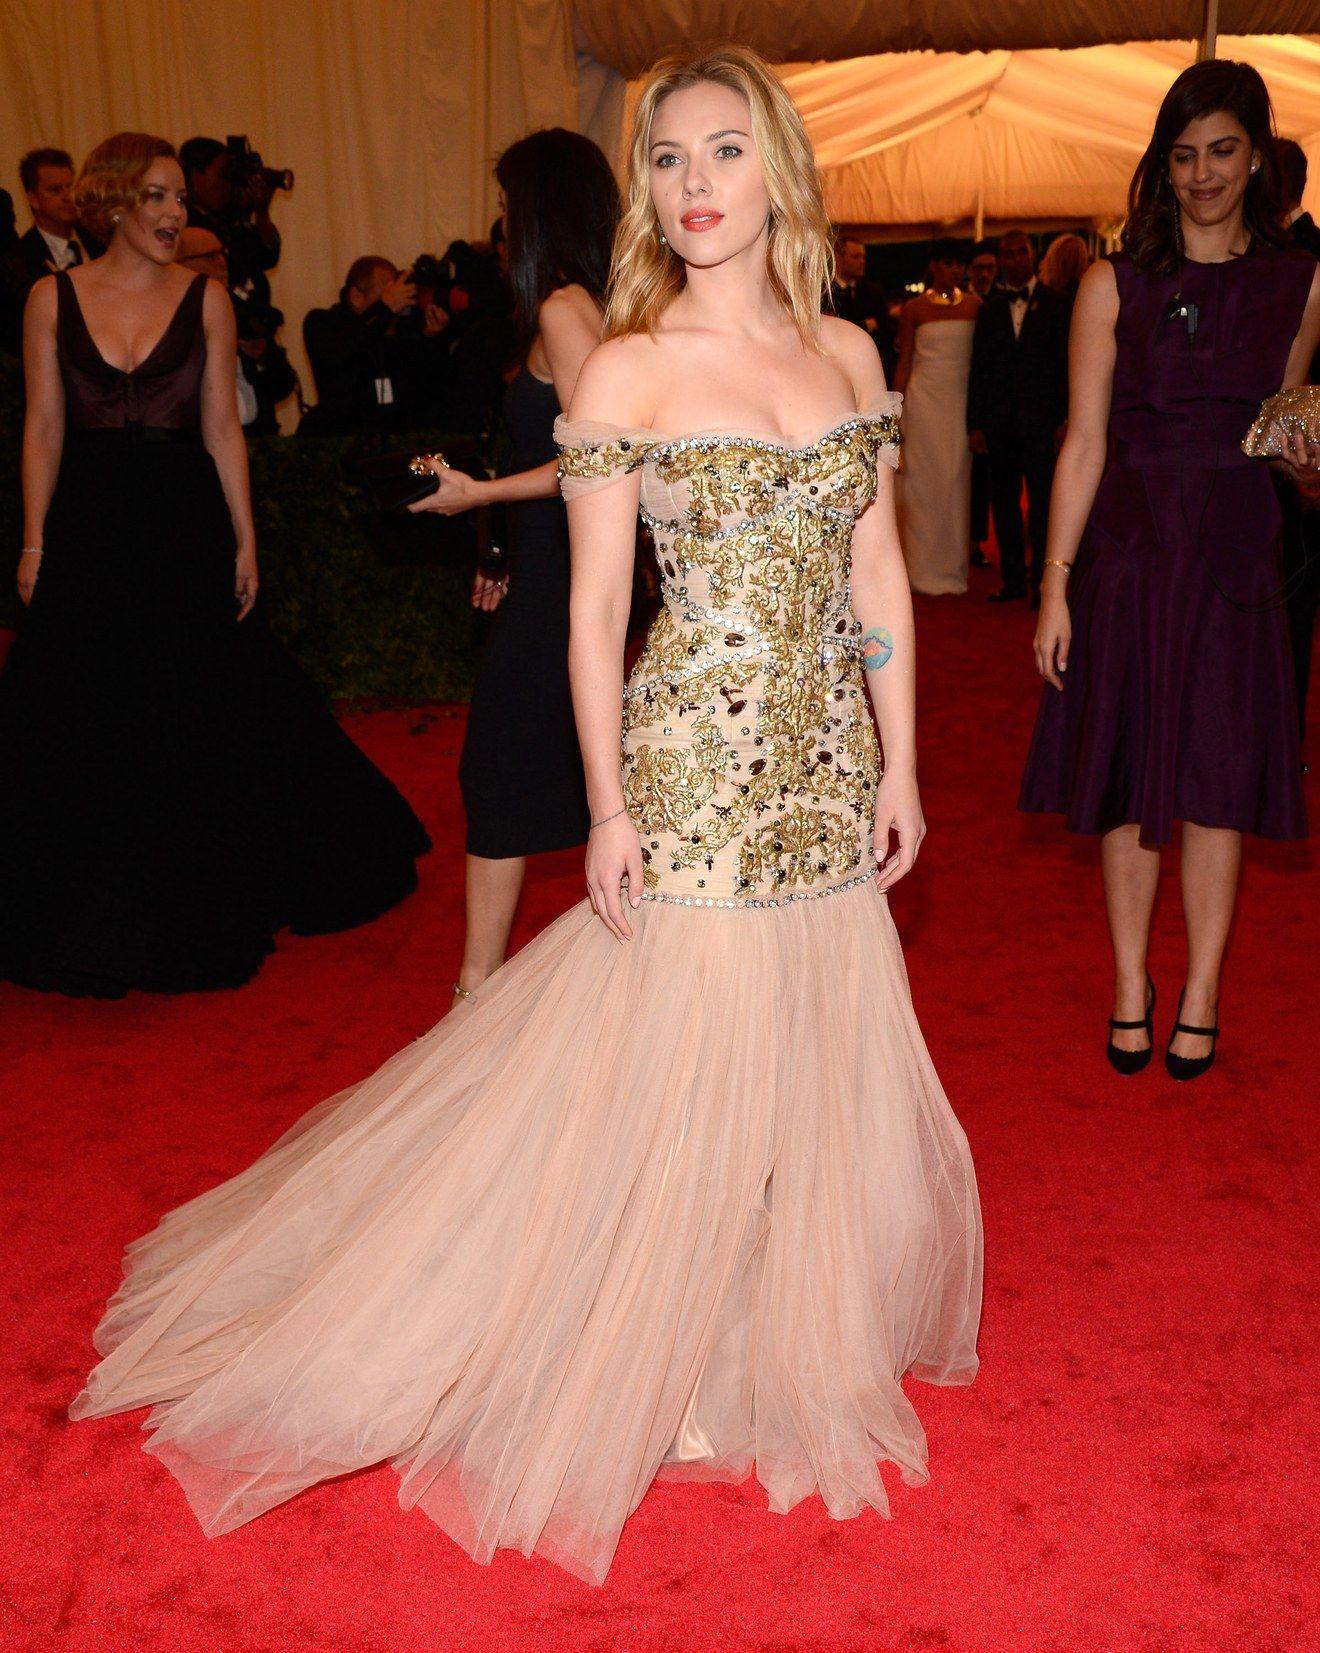 Scarlett Johansson In Dolce Gabbana 2012 Met Gala Dresses Gala Dresses Met Gala Looks